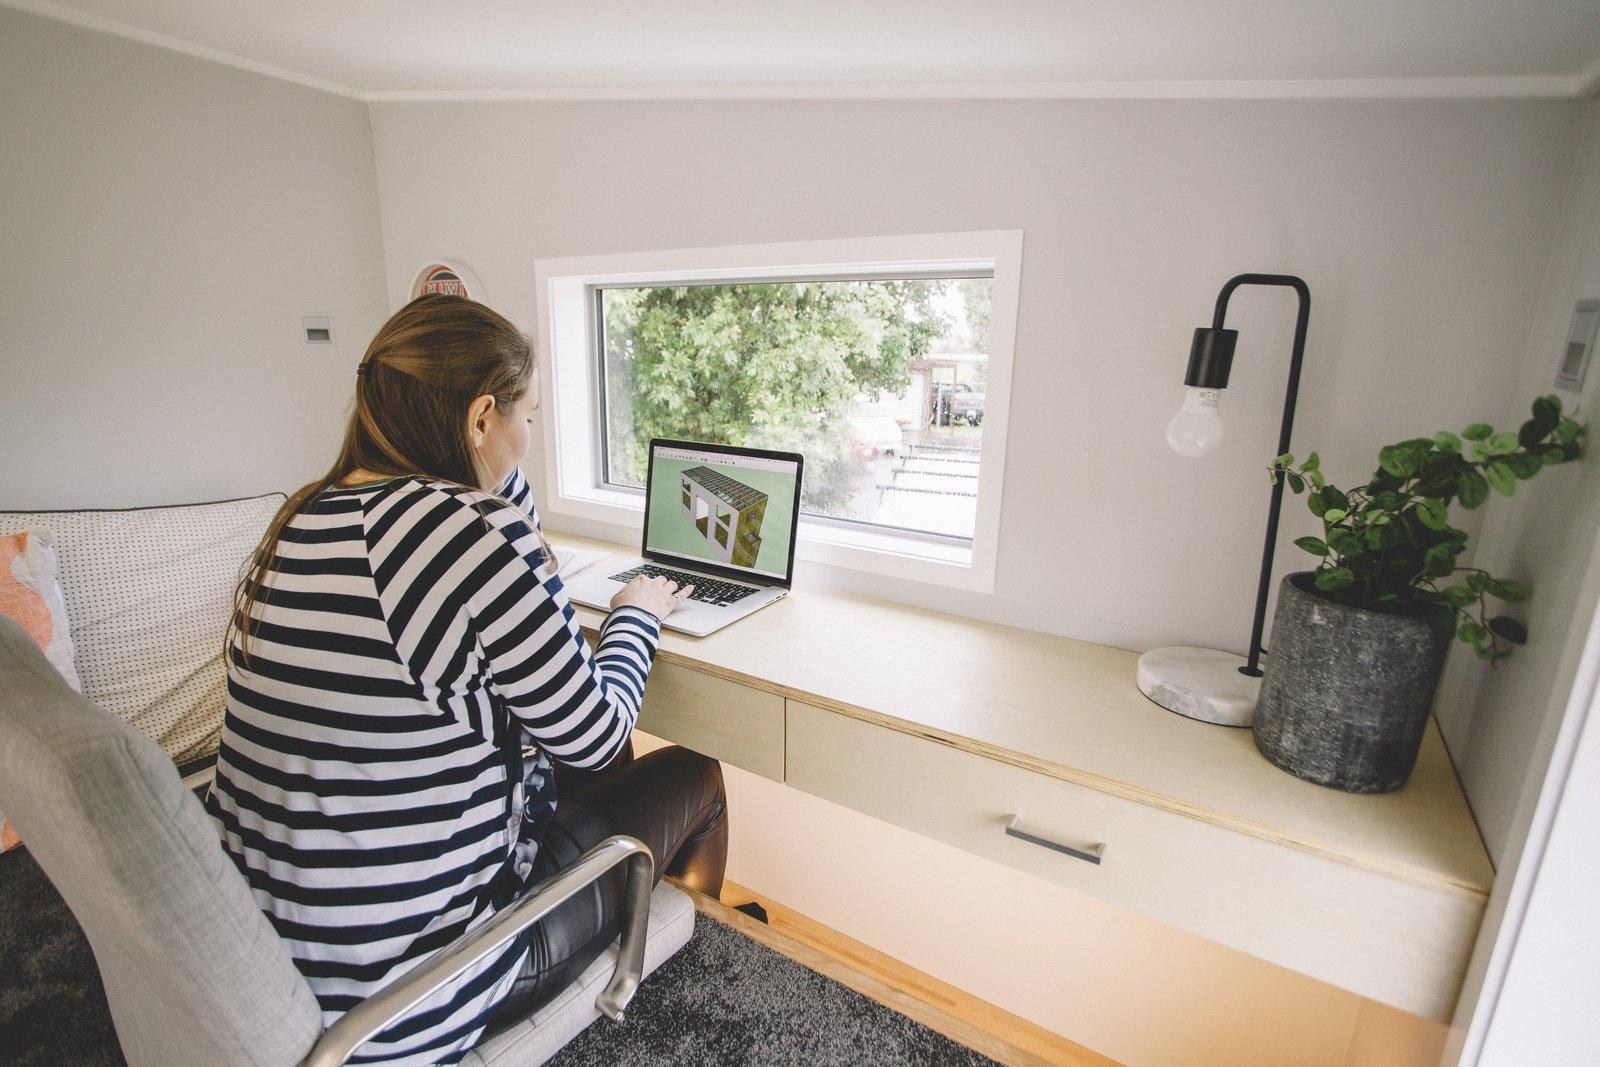 Millennial Tiny House office loft